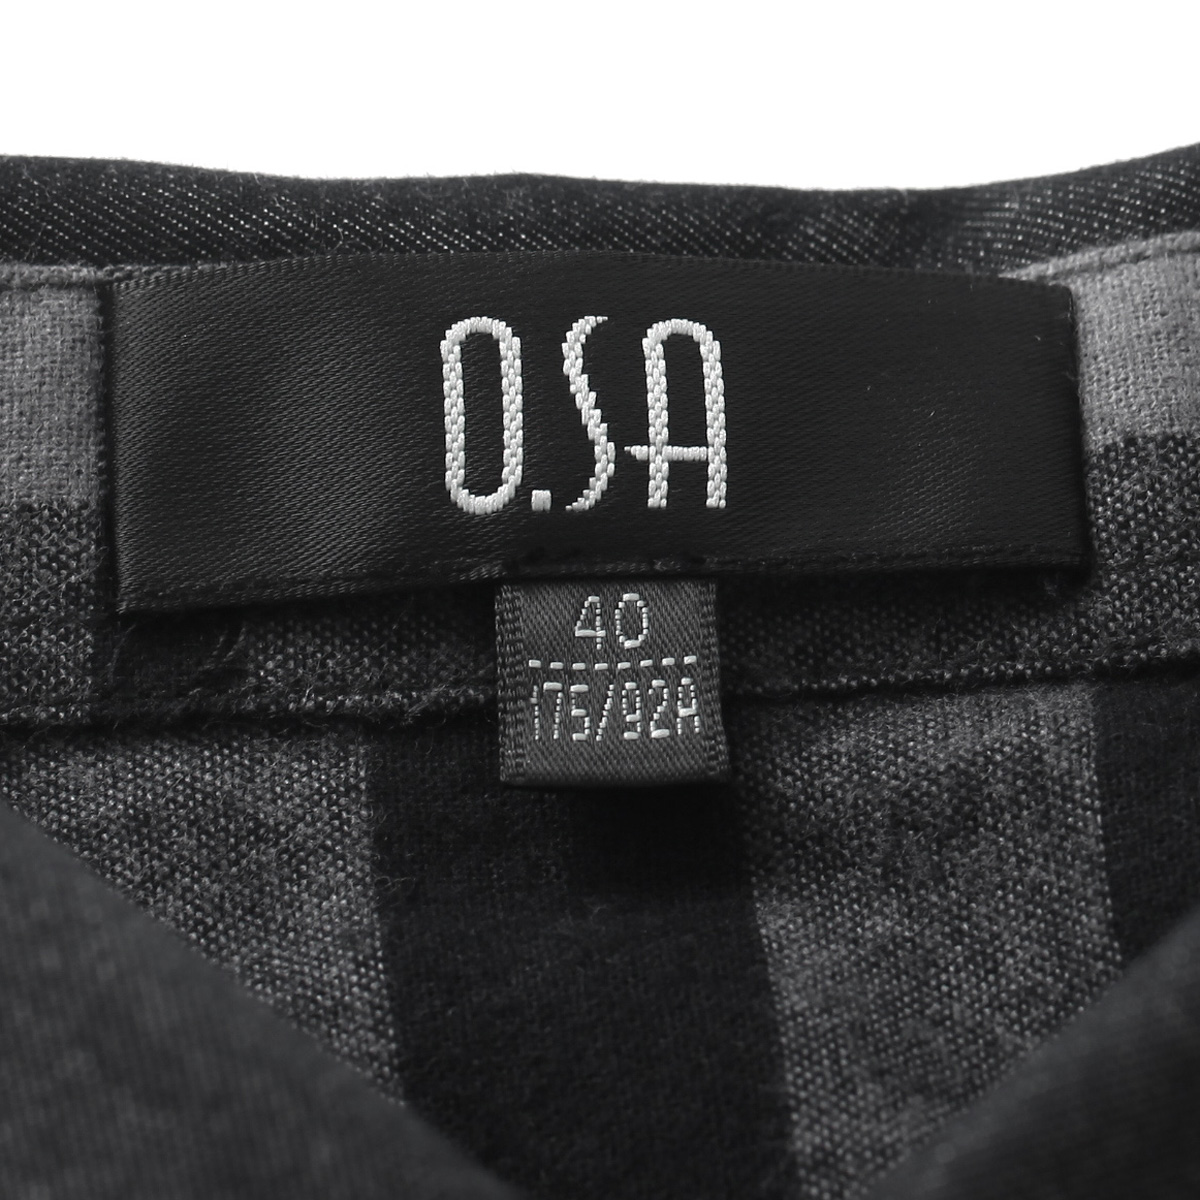 Рубашка мужская OSA mc39044 2013